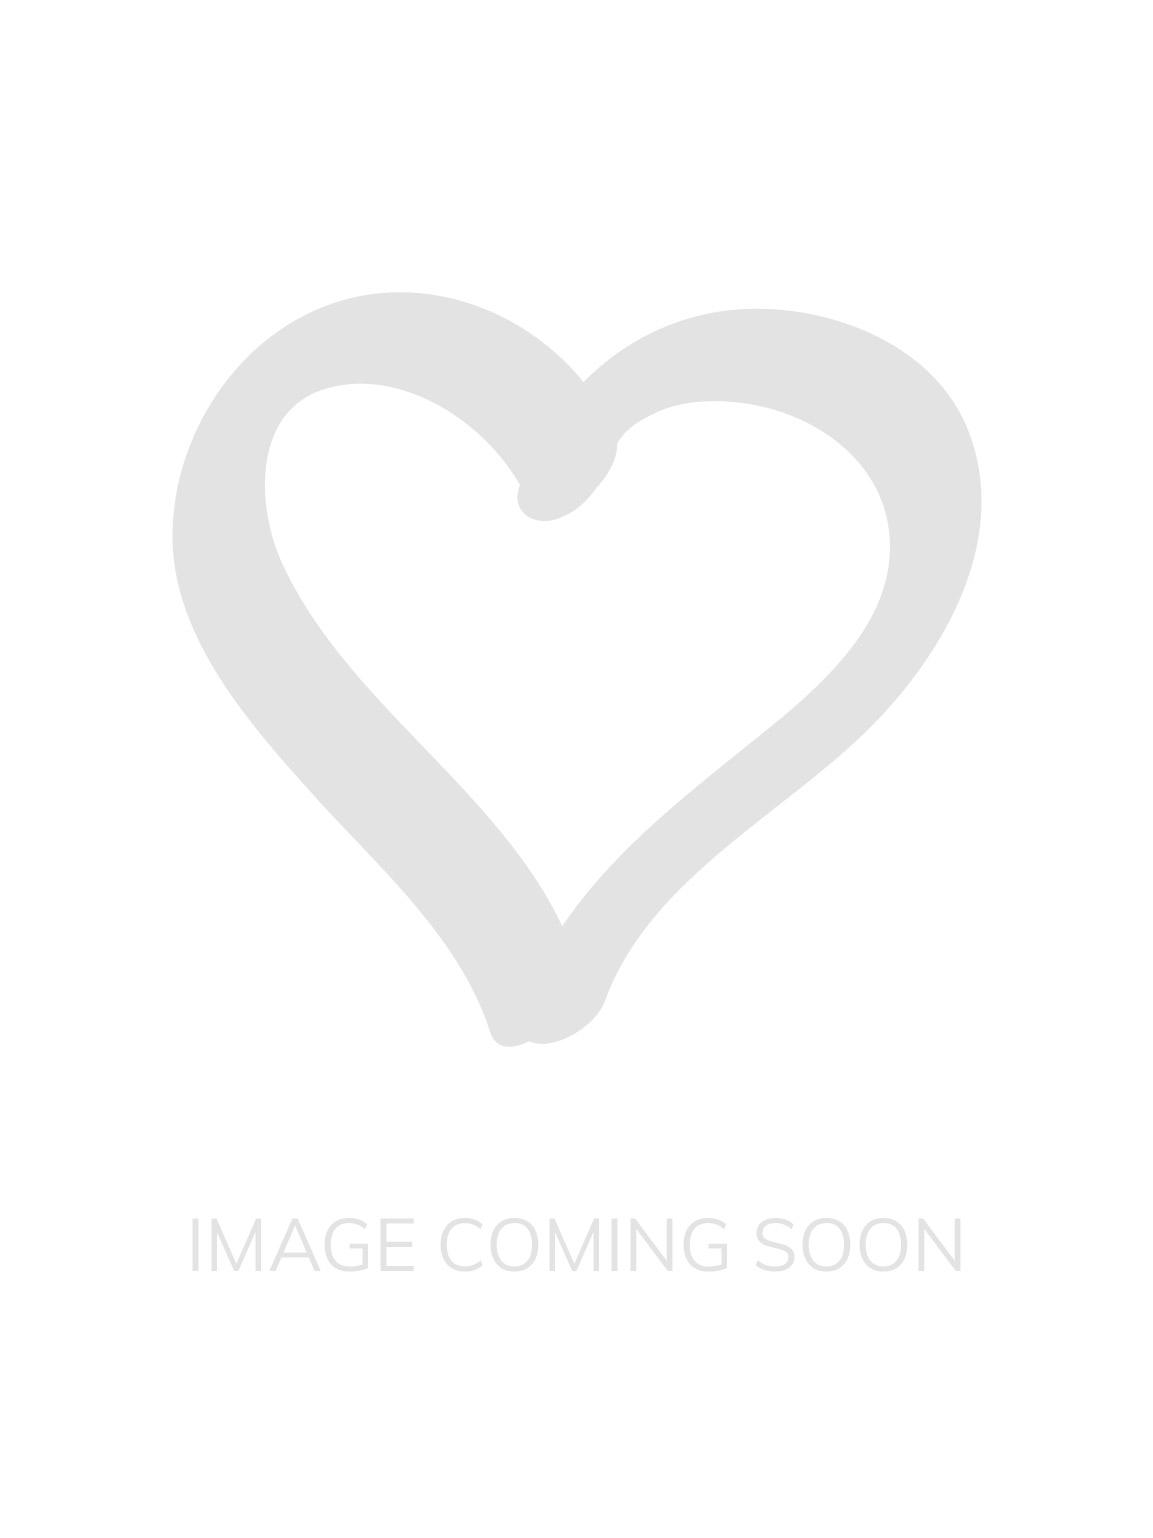 9d0822ec39 Sexy Angel Spotlight WHU Push Up Bra - Bohemian Rose